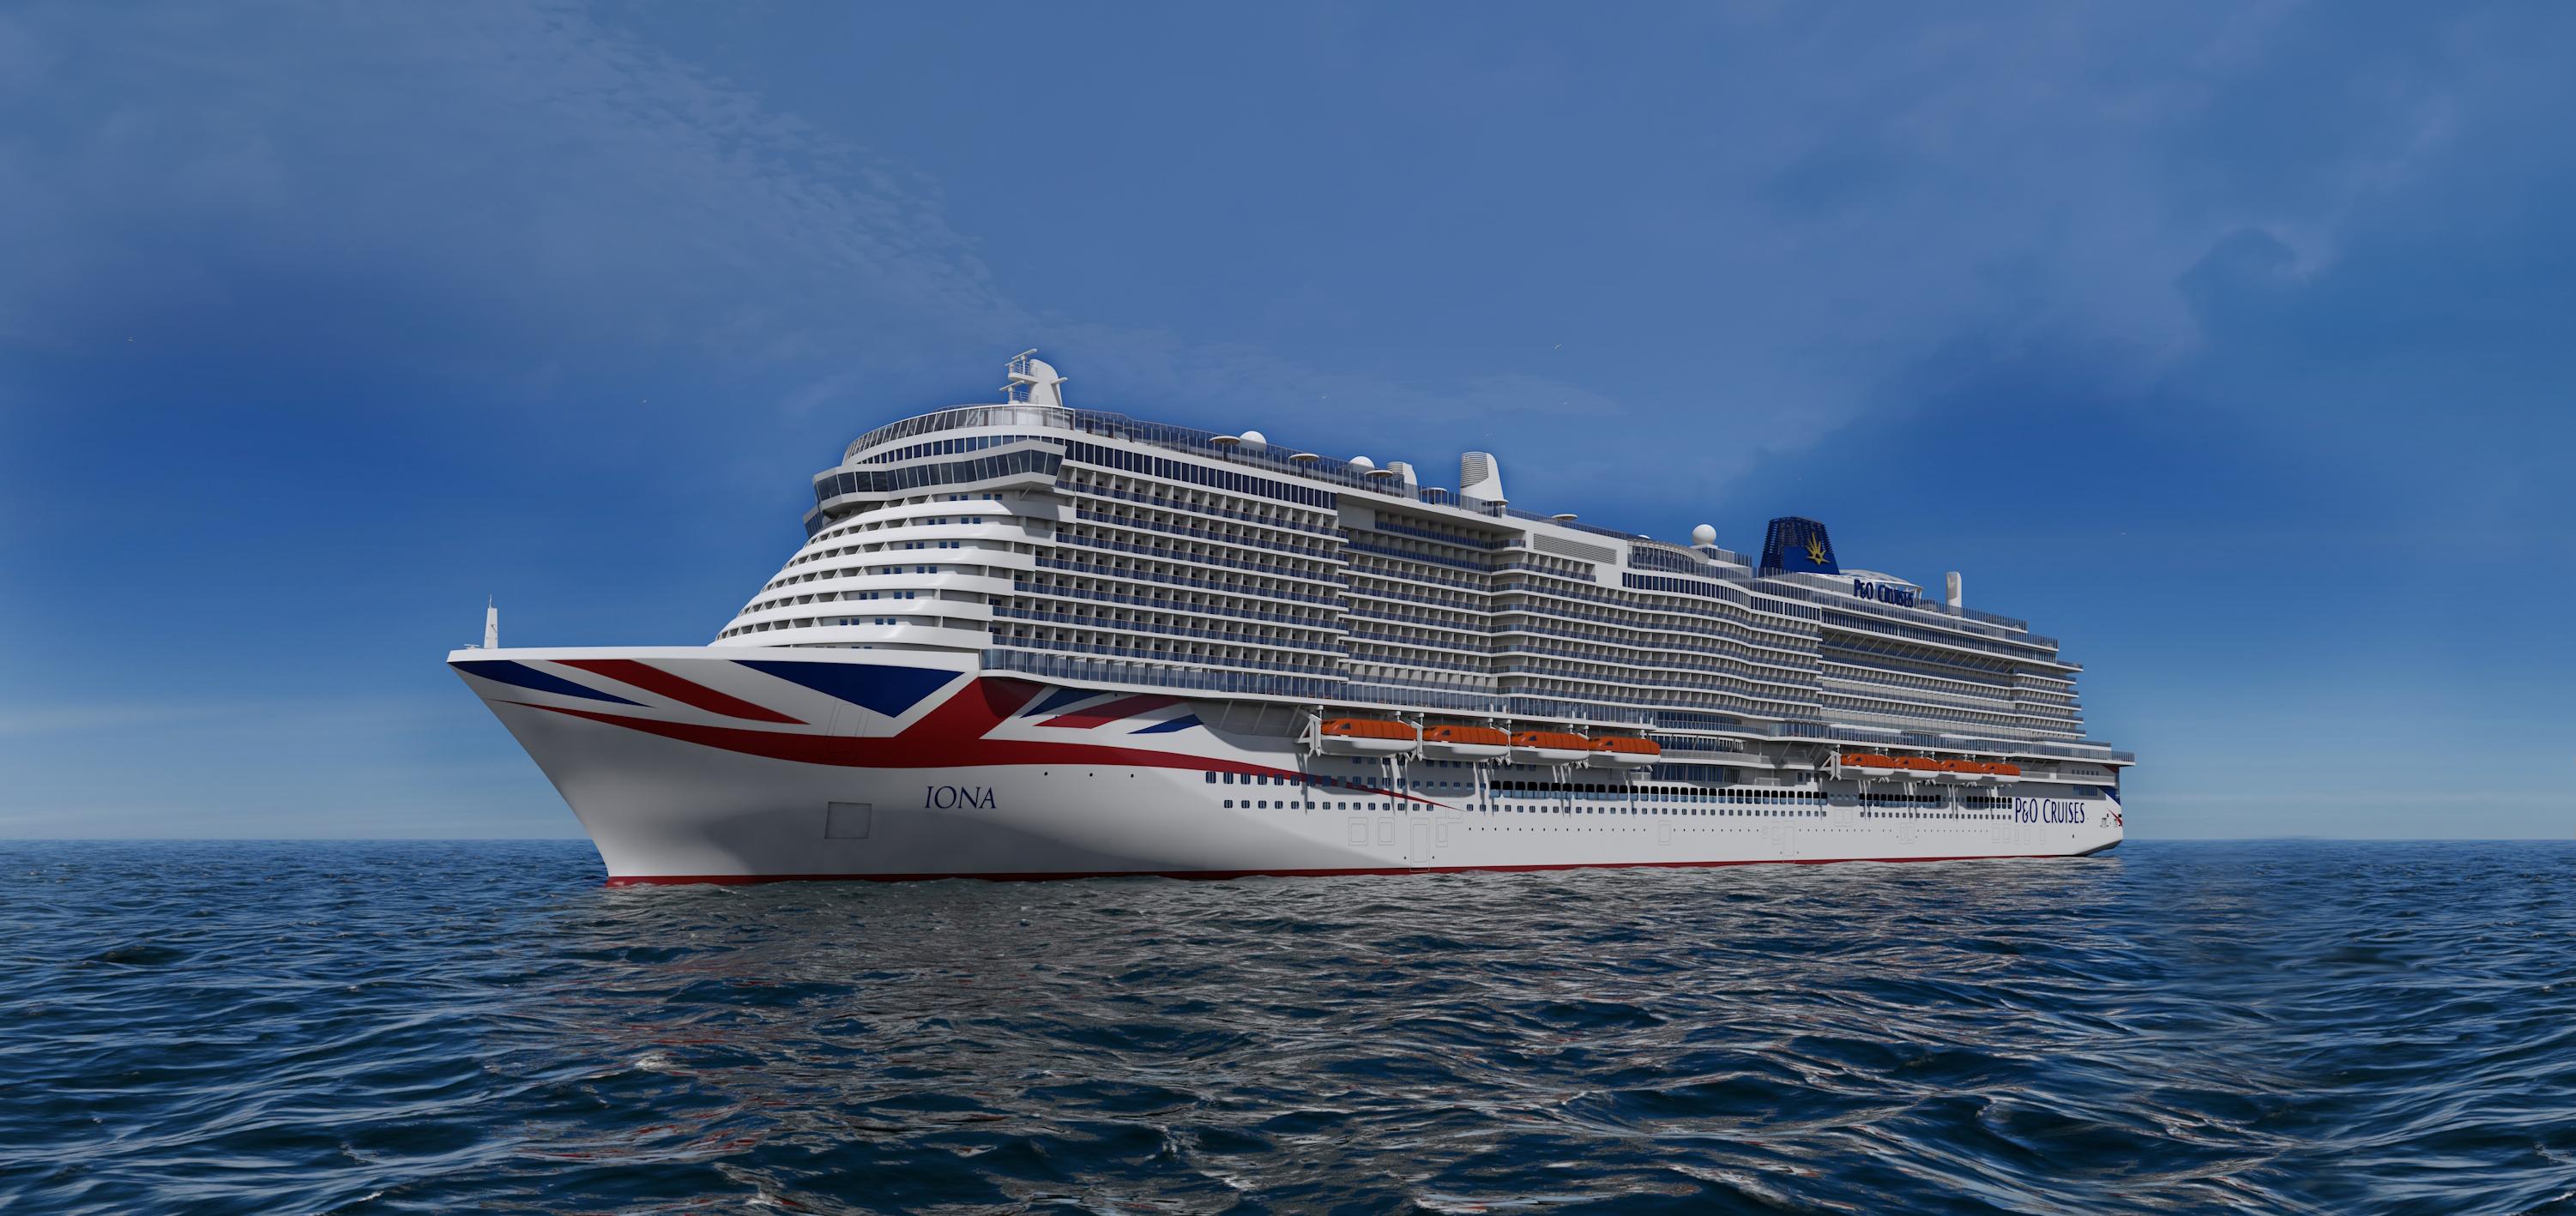 P Amp O Cruises Iona Welcome To The Pleasure Dome World Of